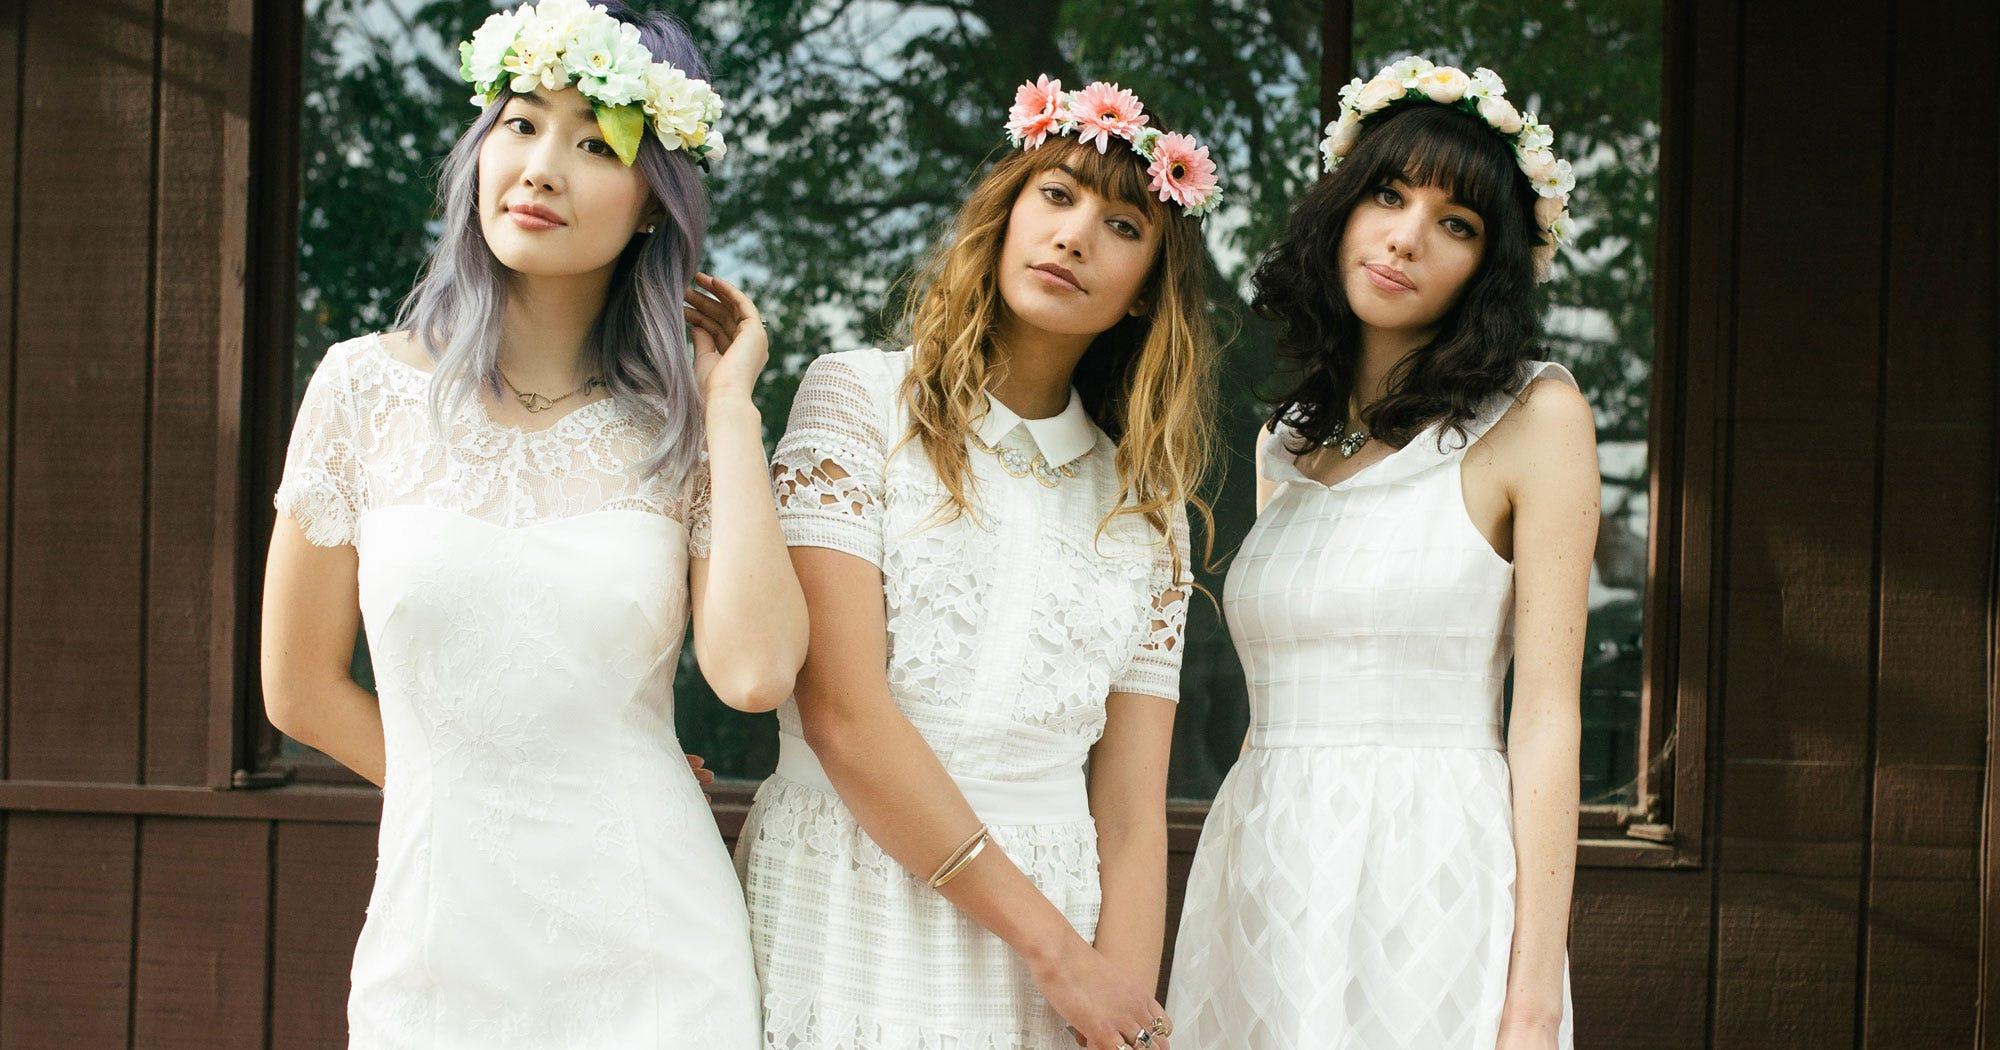 modcloth bridal modcloth wedding dresses